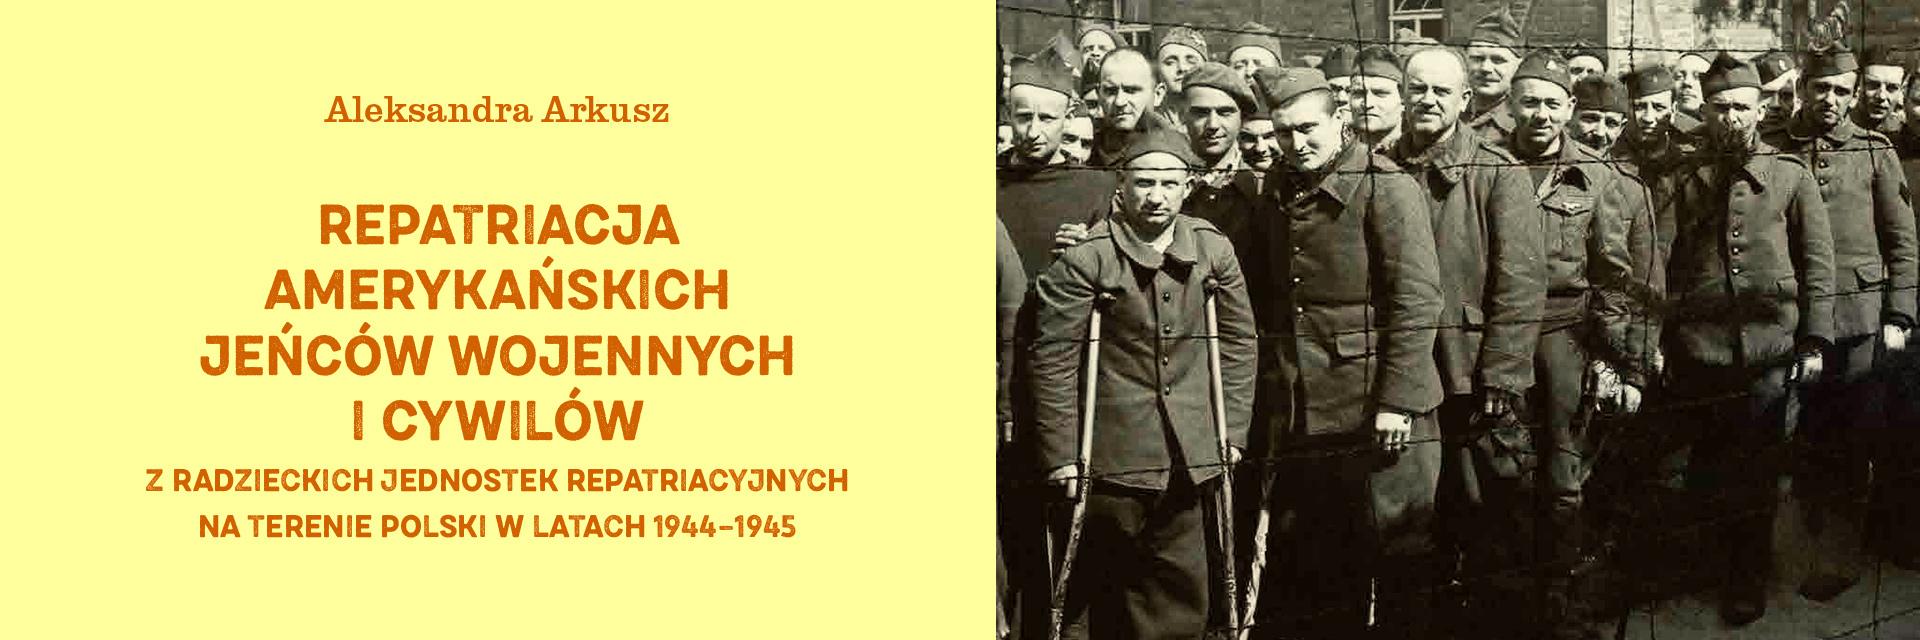 Collegium Kołłataja Księgarnia Akademicka